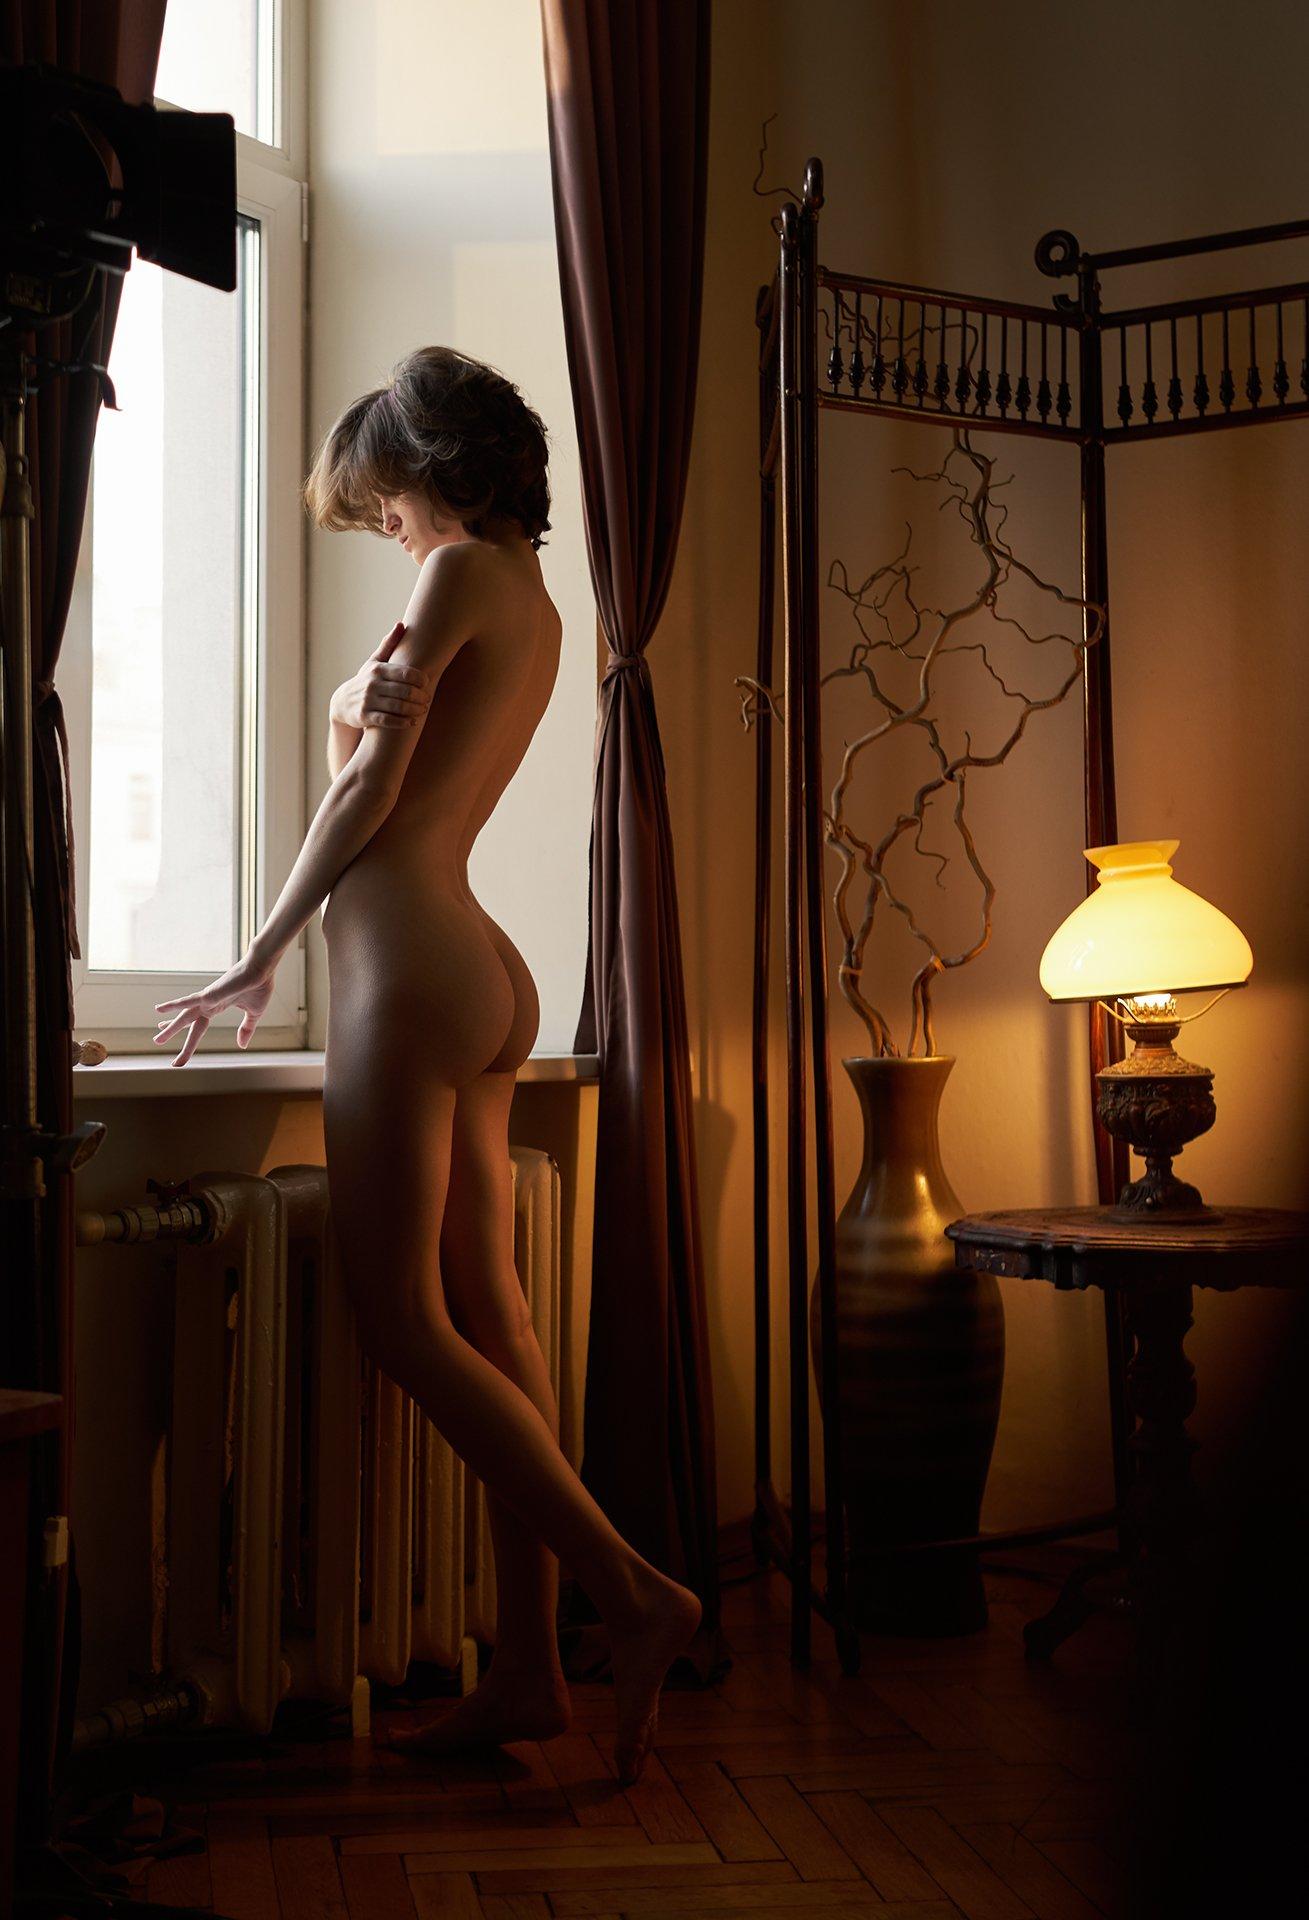 girl, nude, naked, at home, natural light, lamp, antique, window, worm, body, saint-petersburg,, Роман Филиппов